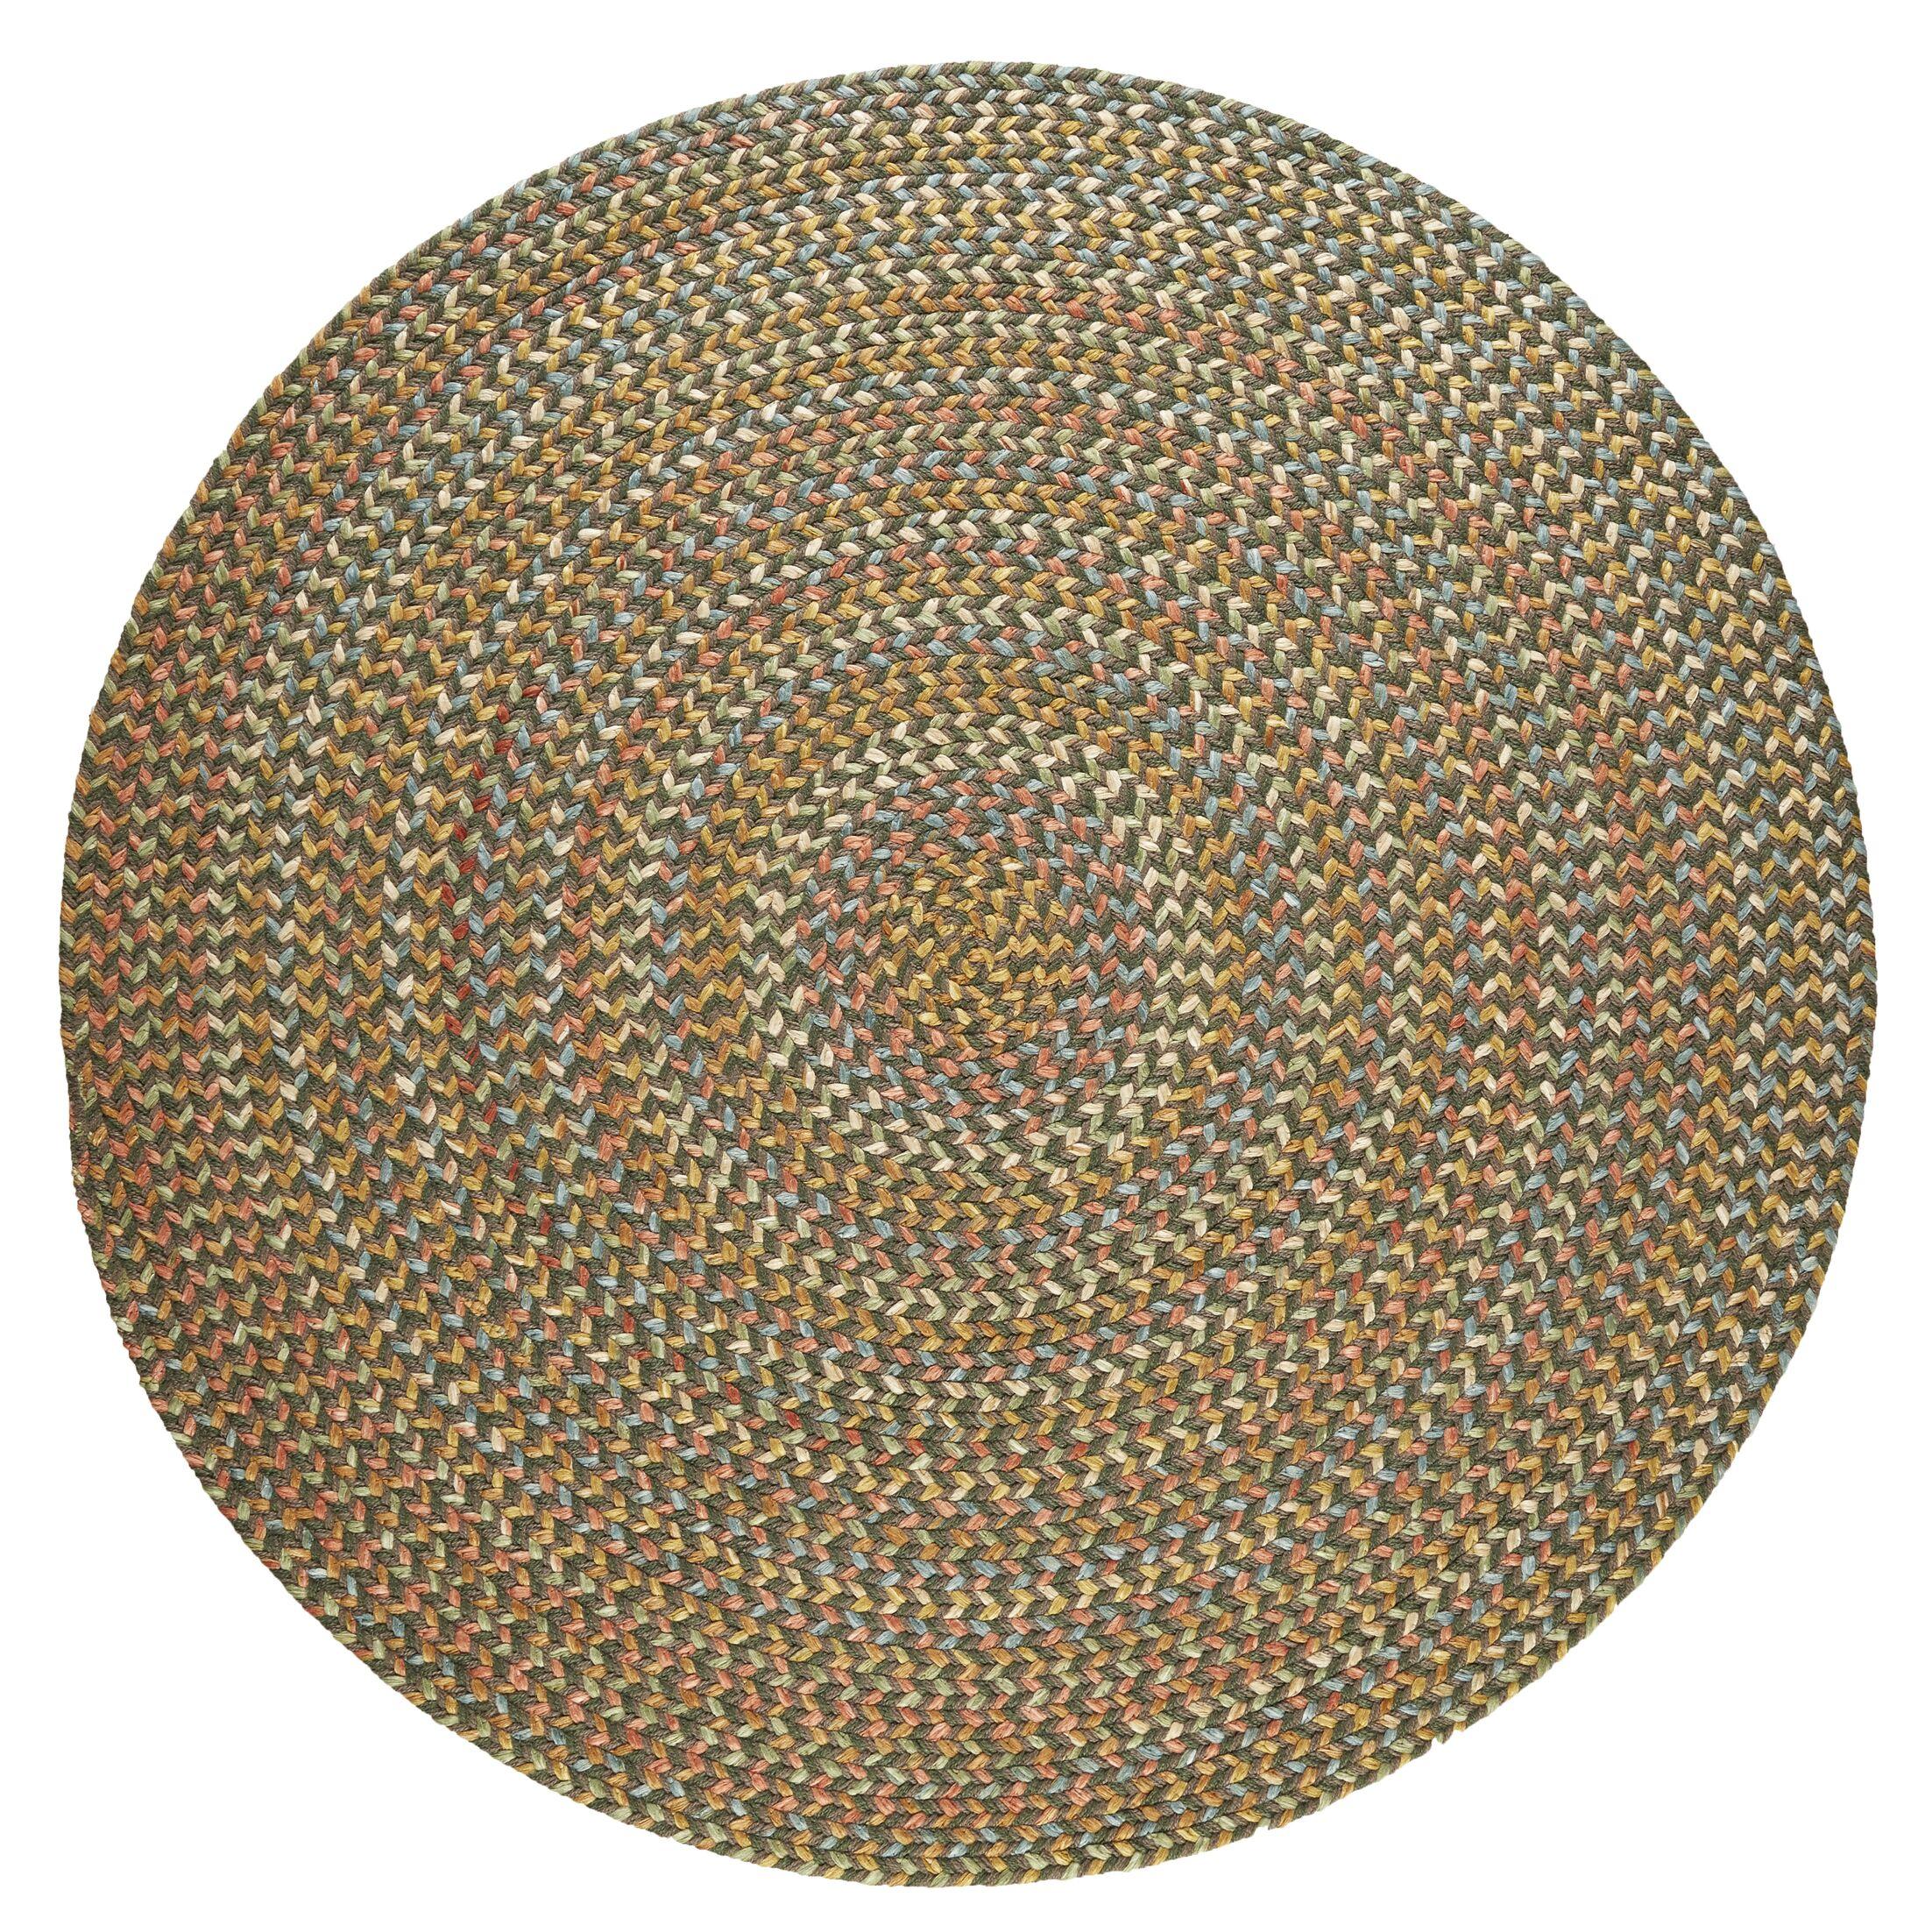 Handmade Dark Taupe Indoor/Outdoor Area Rug Rug Size: Round 8'